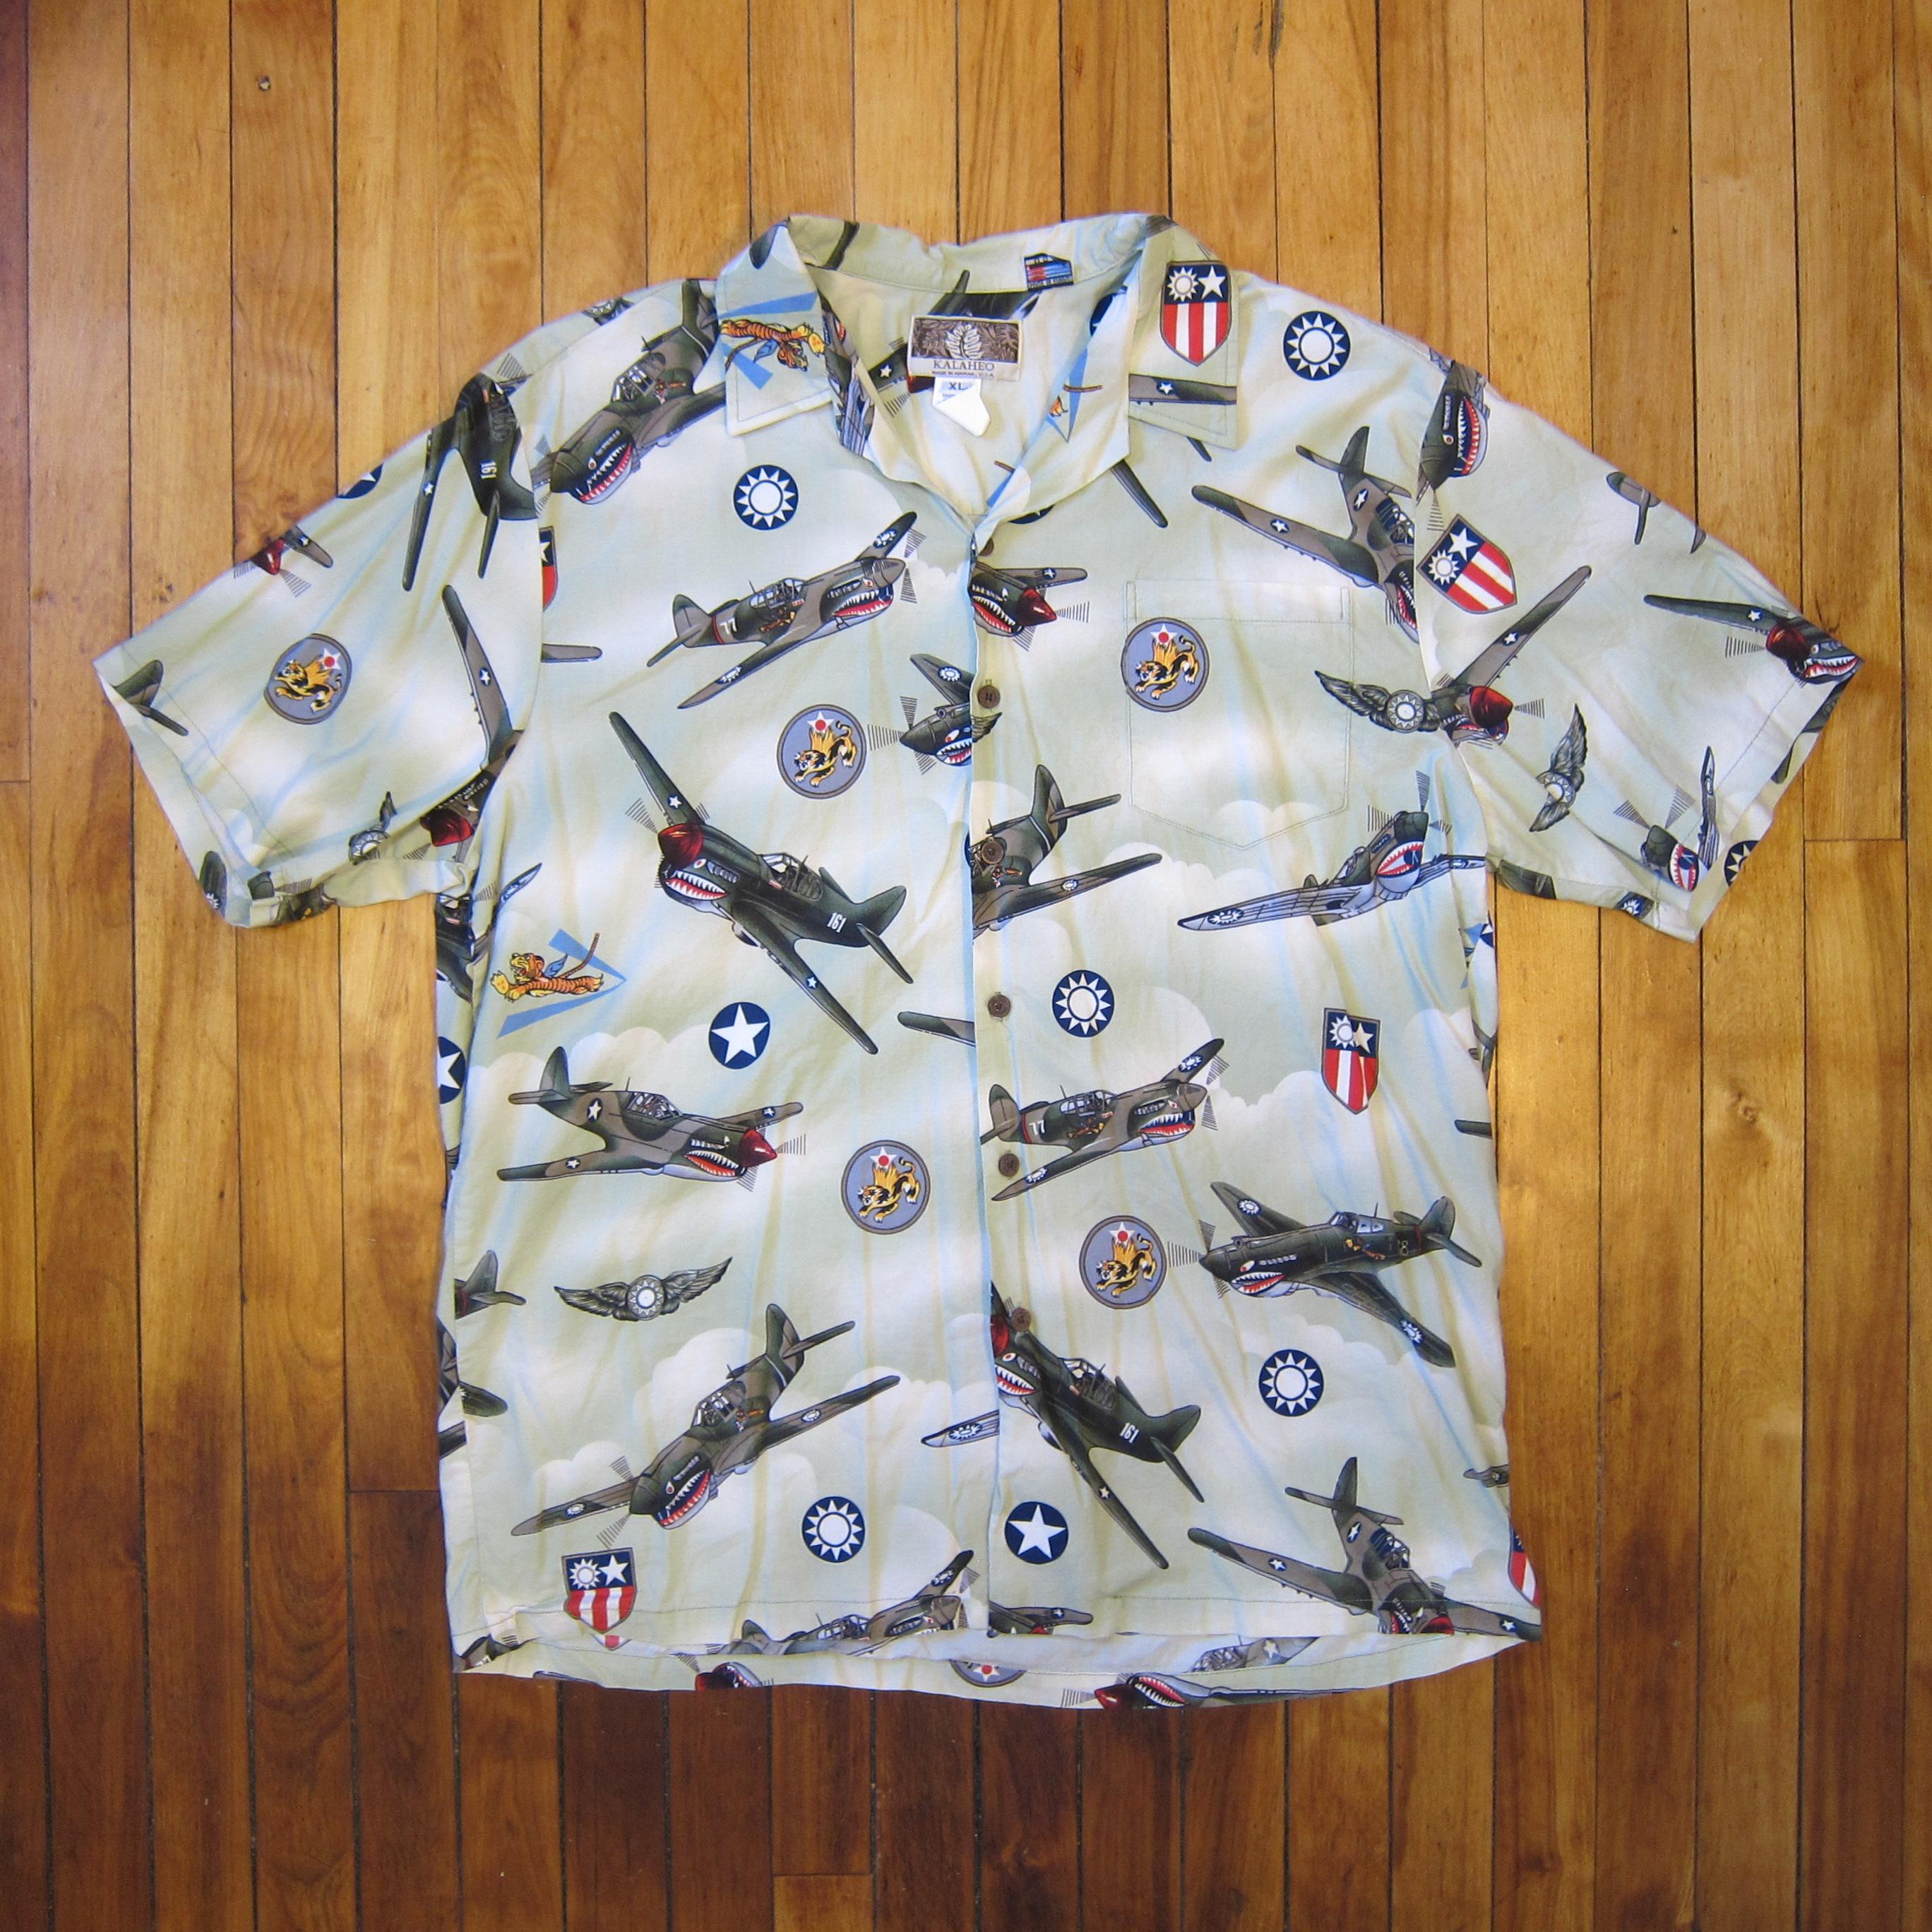 e60362fb Kalaheo Wwii Bomber Short Sleeve Hawaiian Shirt | Grailed